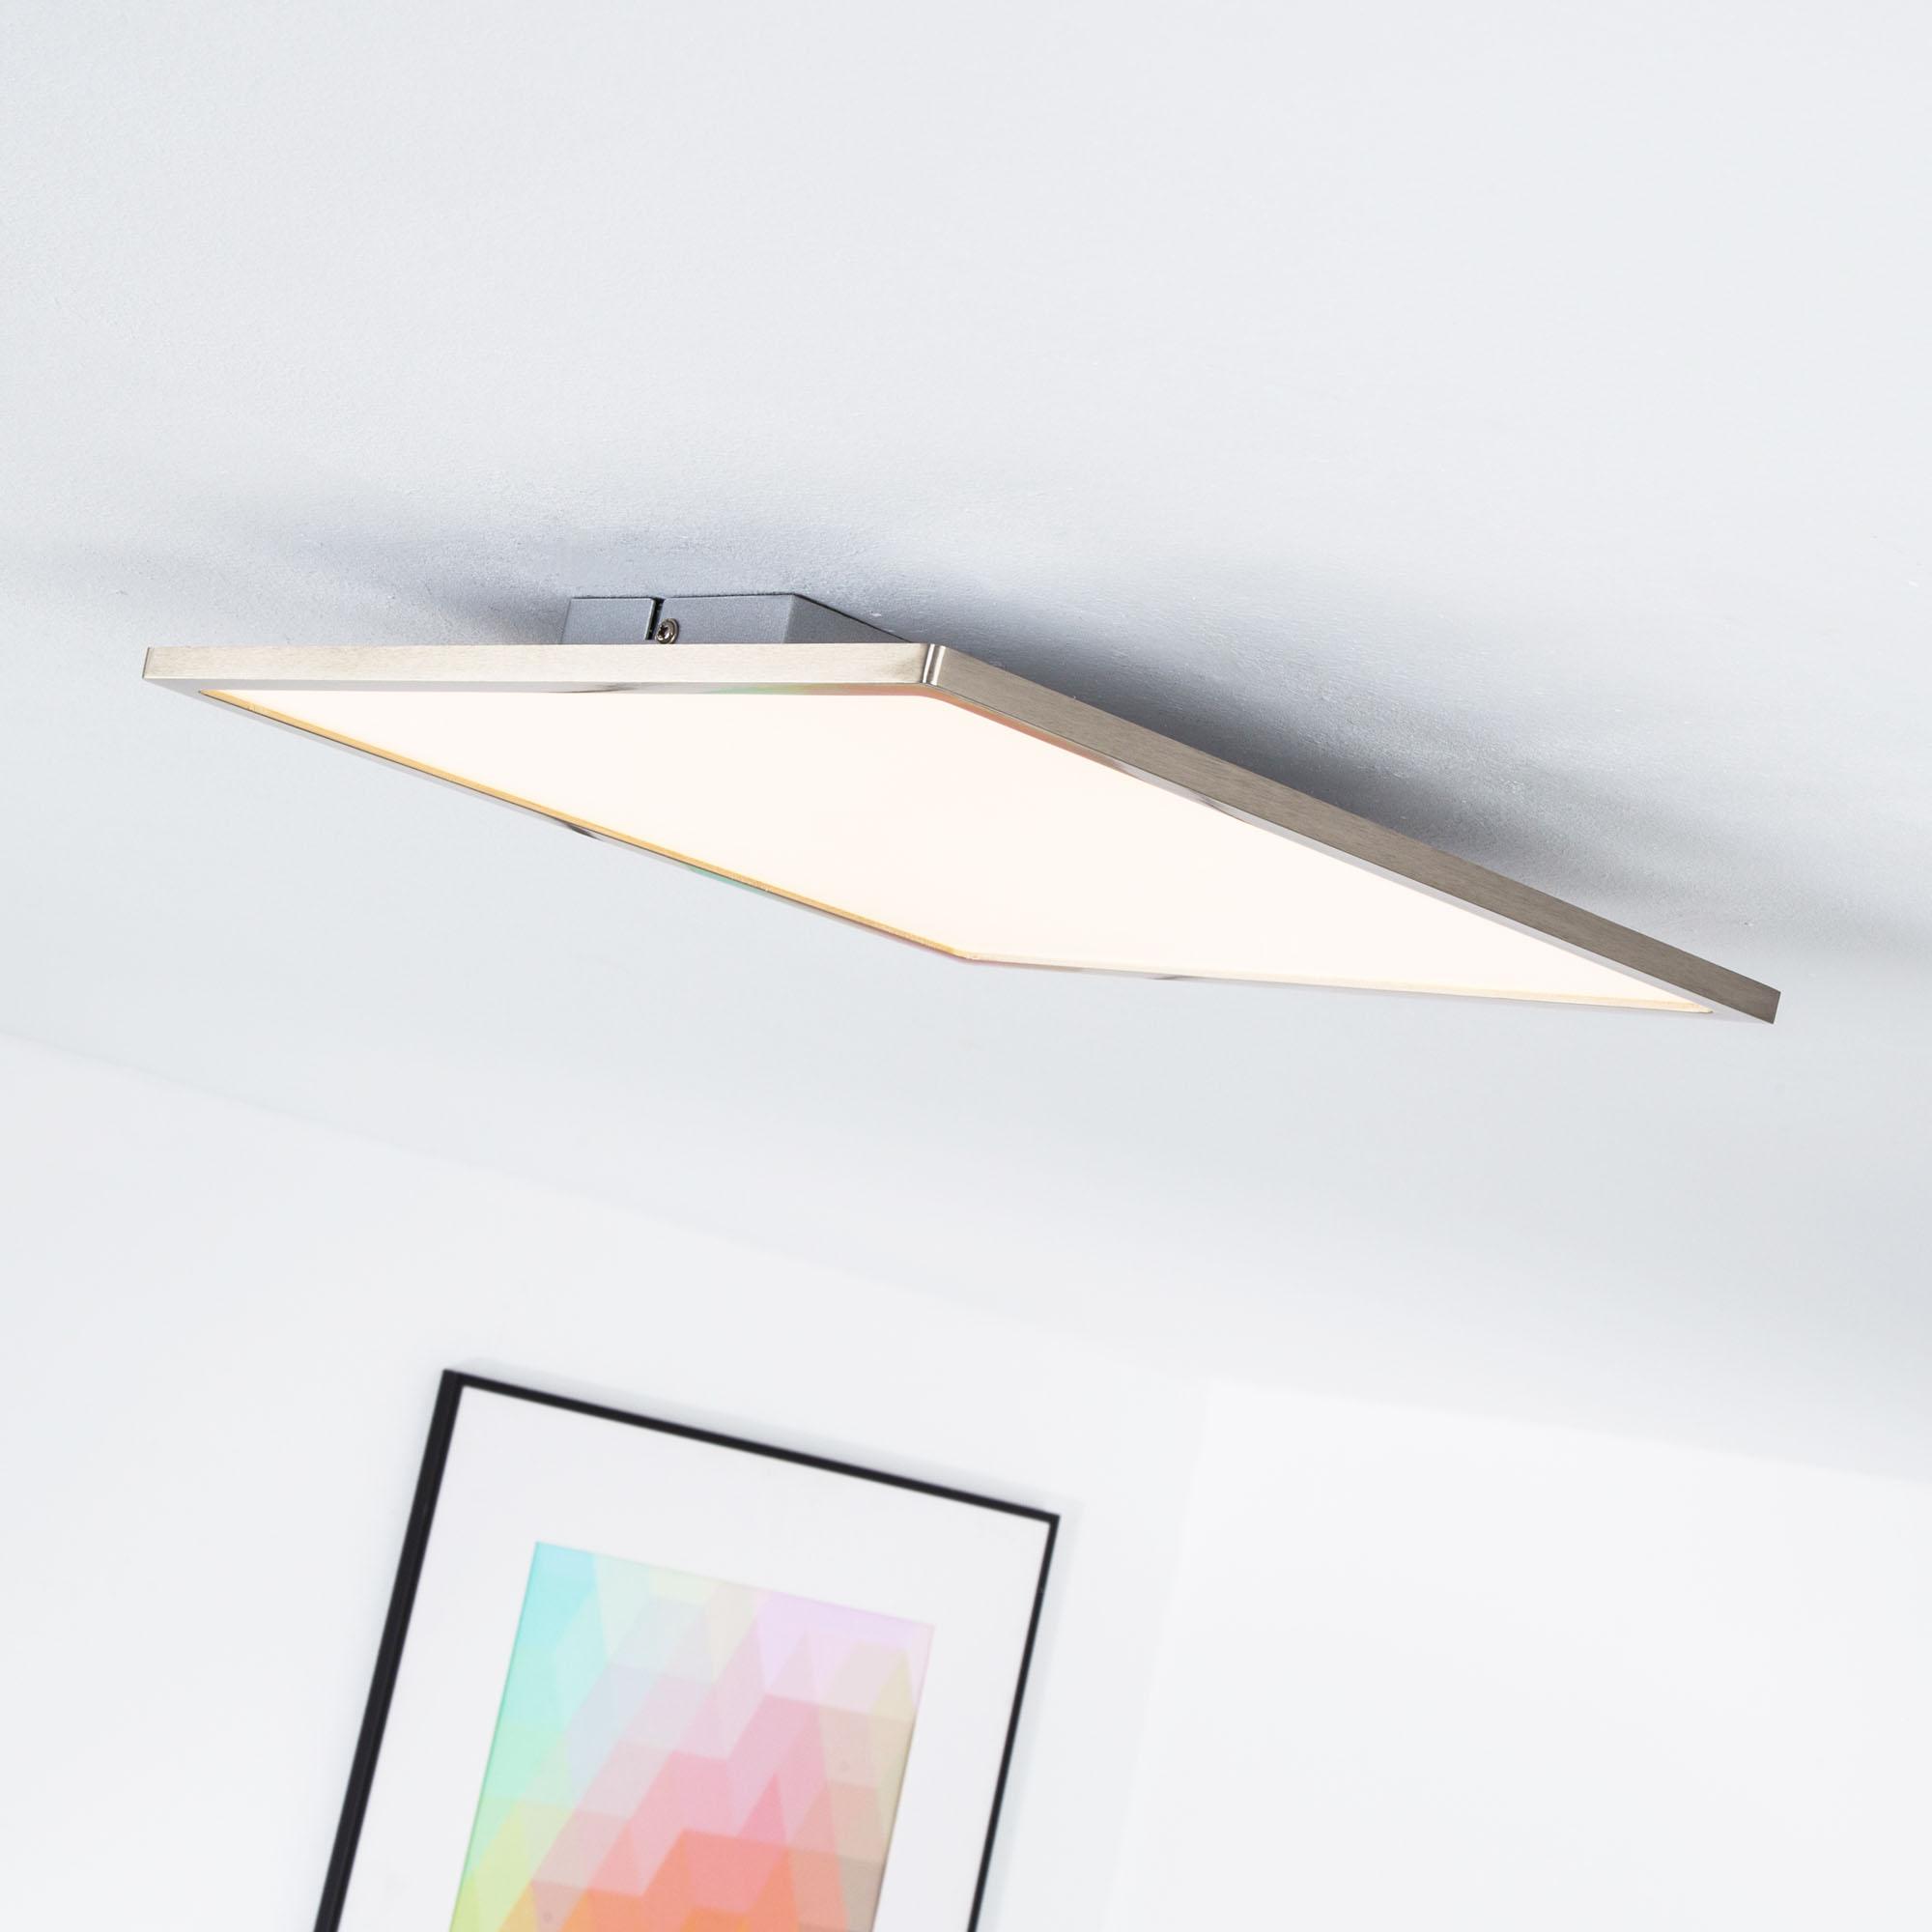 LED Panel für Deckenaufbau dimmbar 35 x 35 cm eckig 1x 20W LED integriert 2000 Lumen 3000K warmweiß Metall Kunststoff eisen